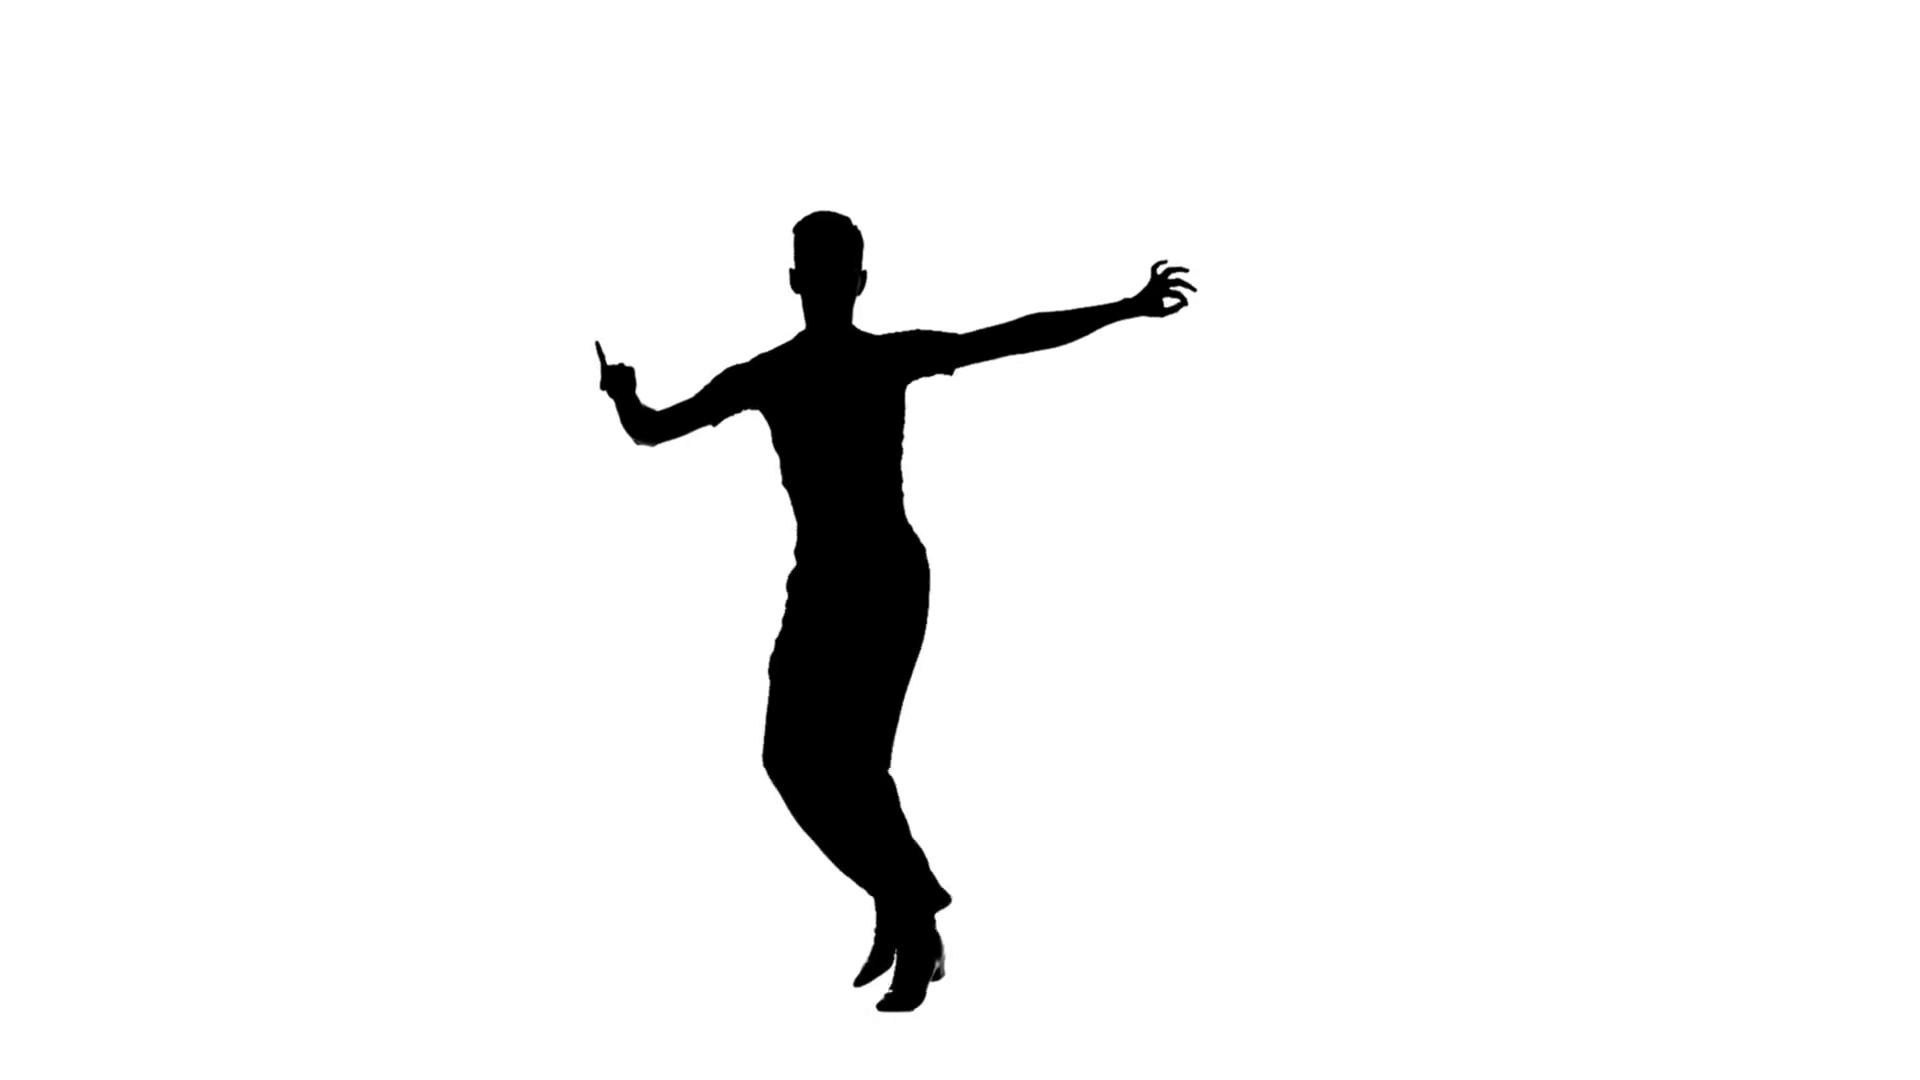 Man solo dancing elements of ballroom dancing. Silhouette, slow motion  Stock Video Footage - VideoBlocks - Ballroom Dancing PNG HD